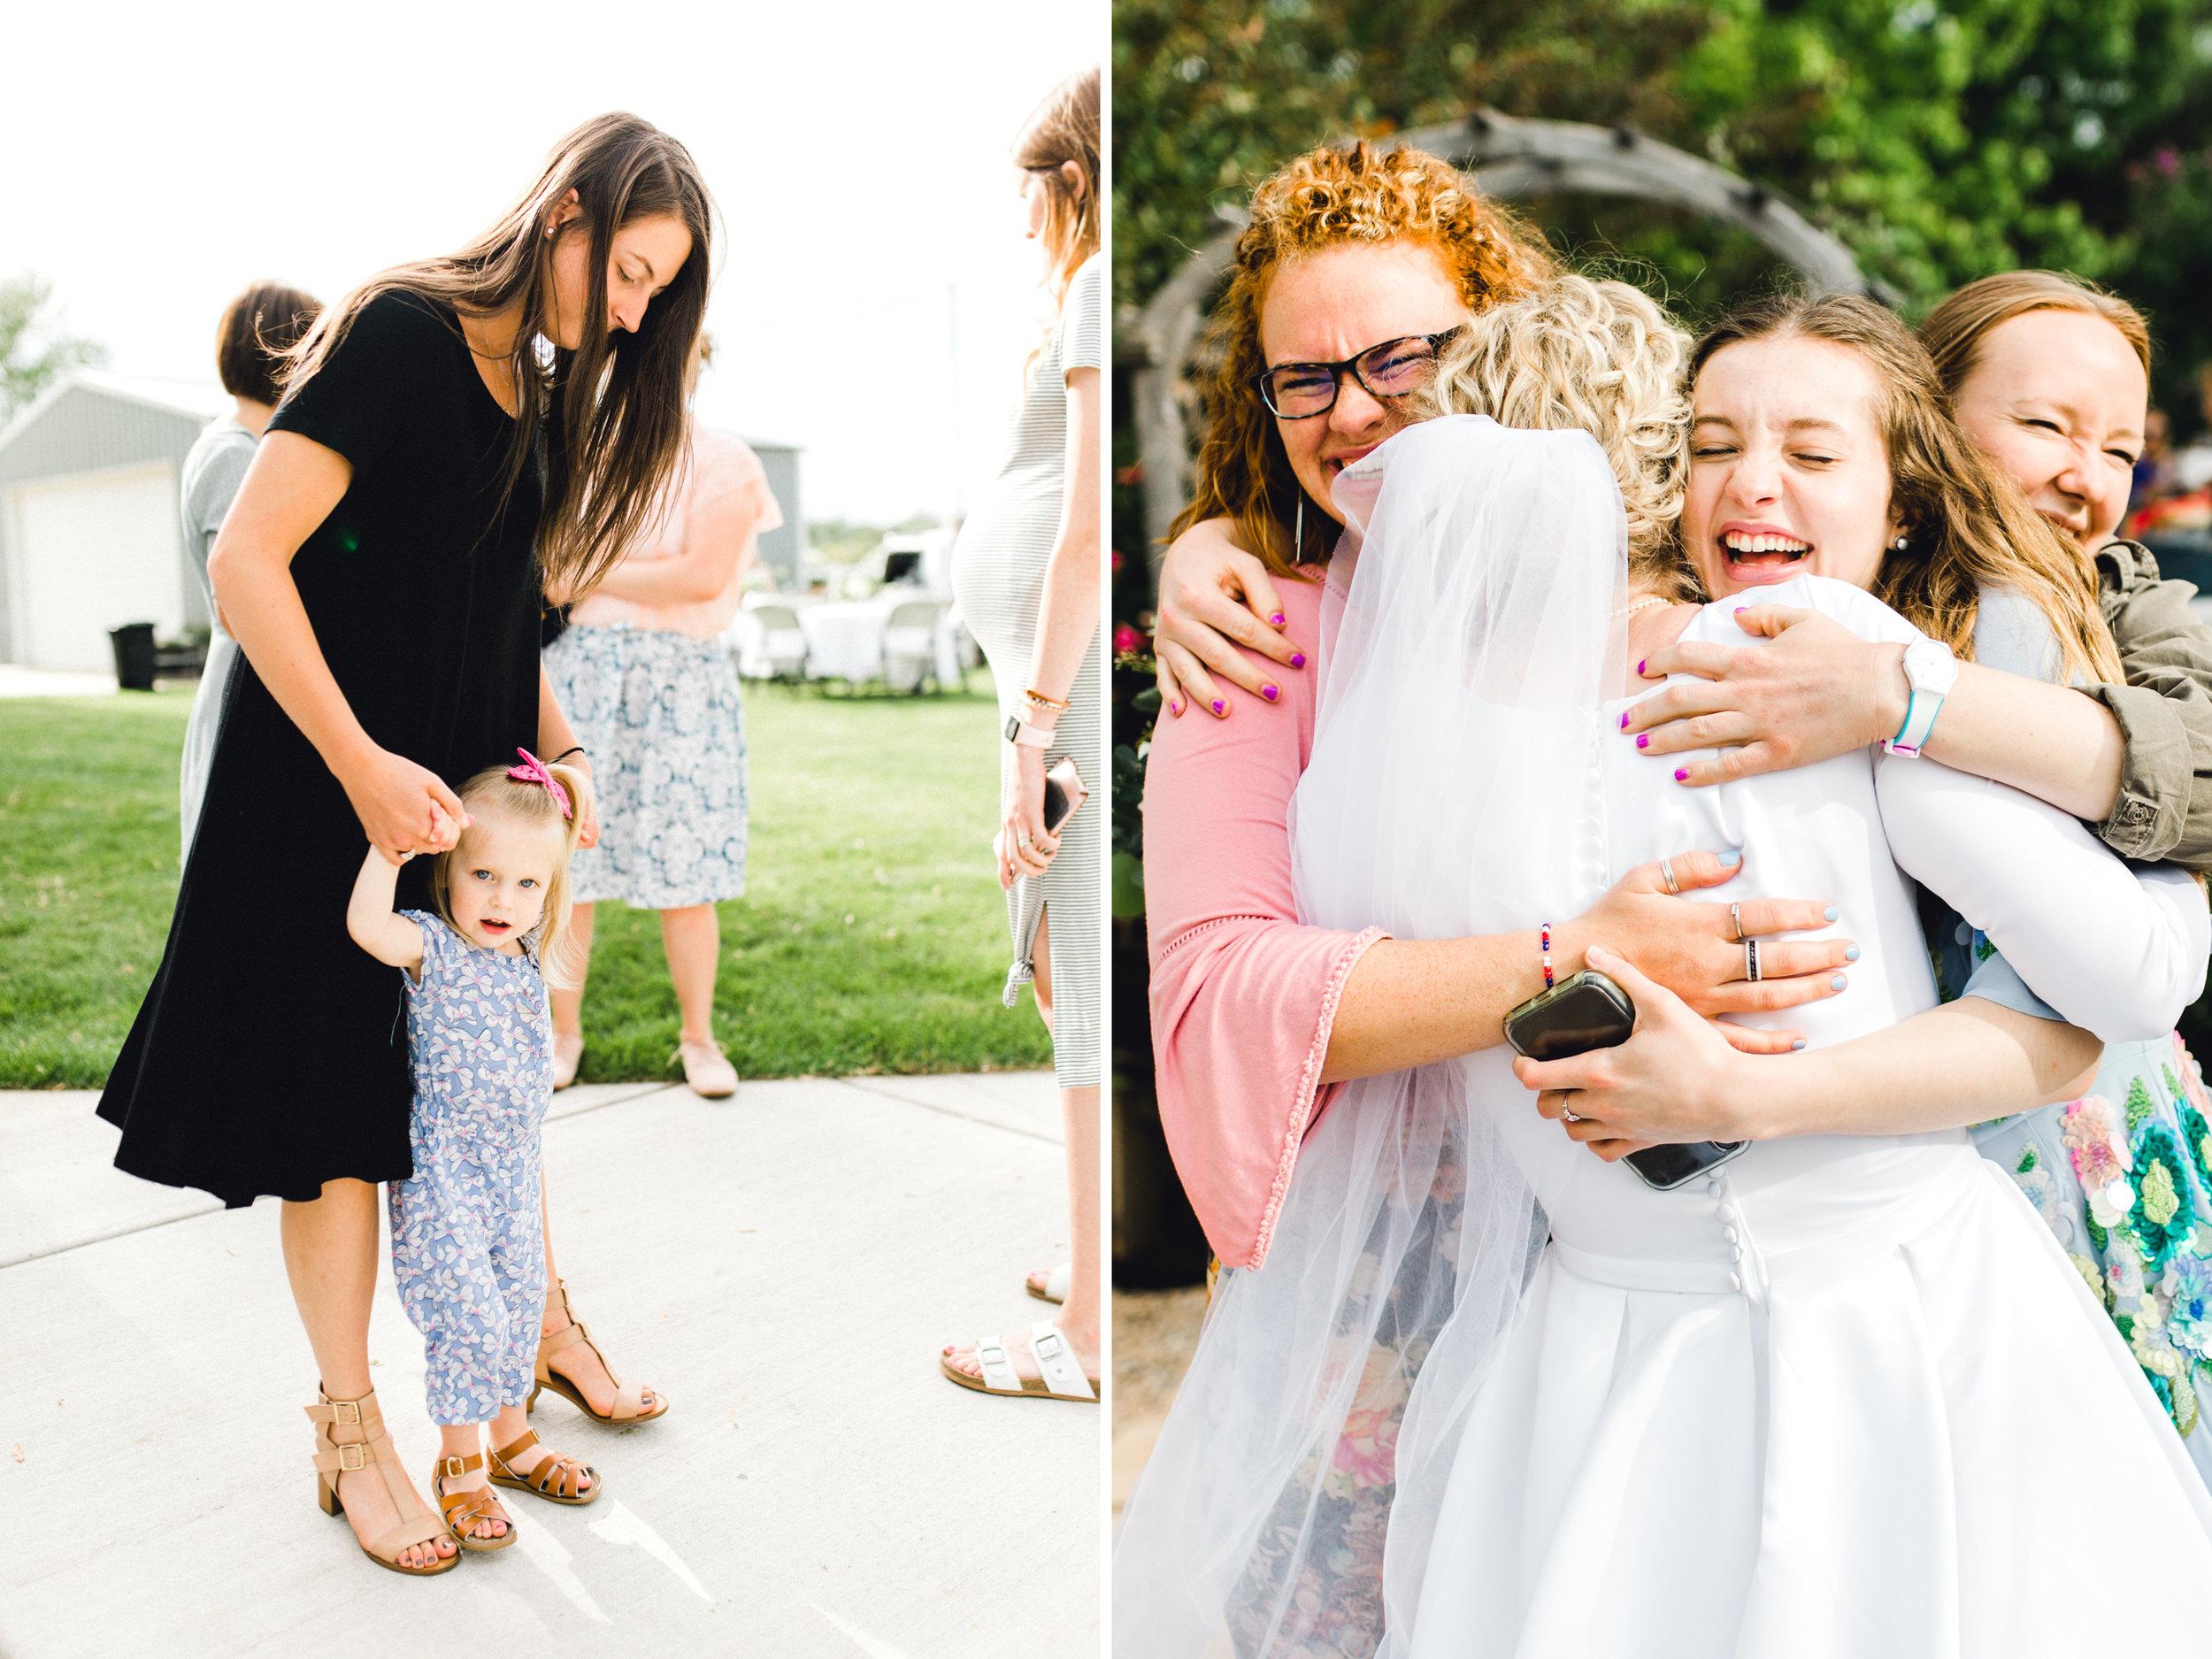 beautiful-outdoor-backyard-wedding-reception-anna-christine-photography-rexburg-idaho-22.jpg